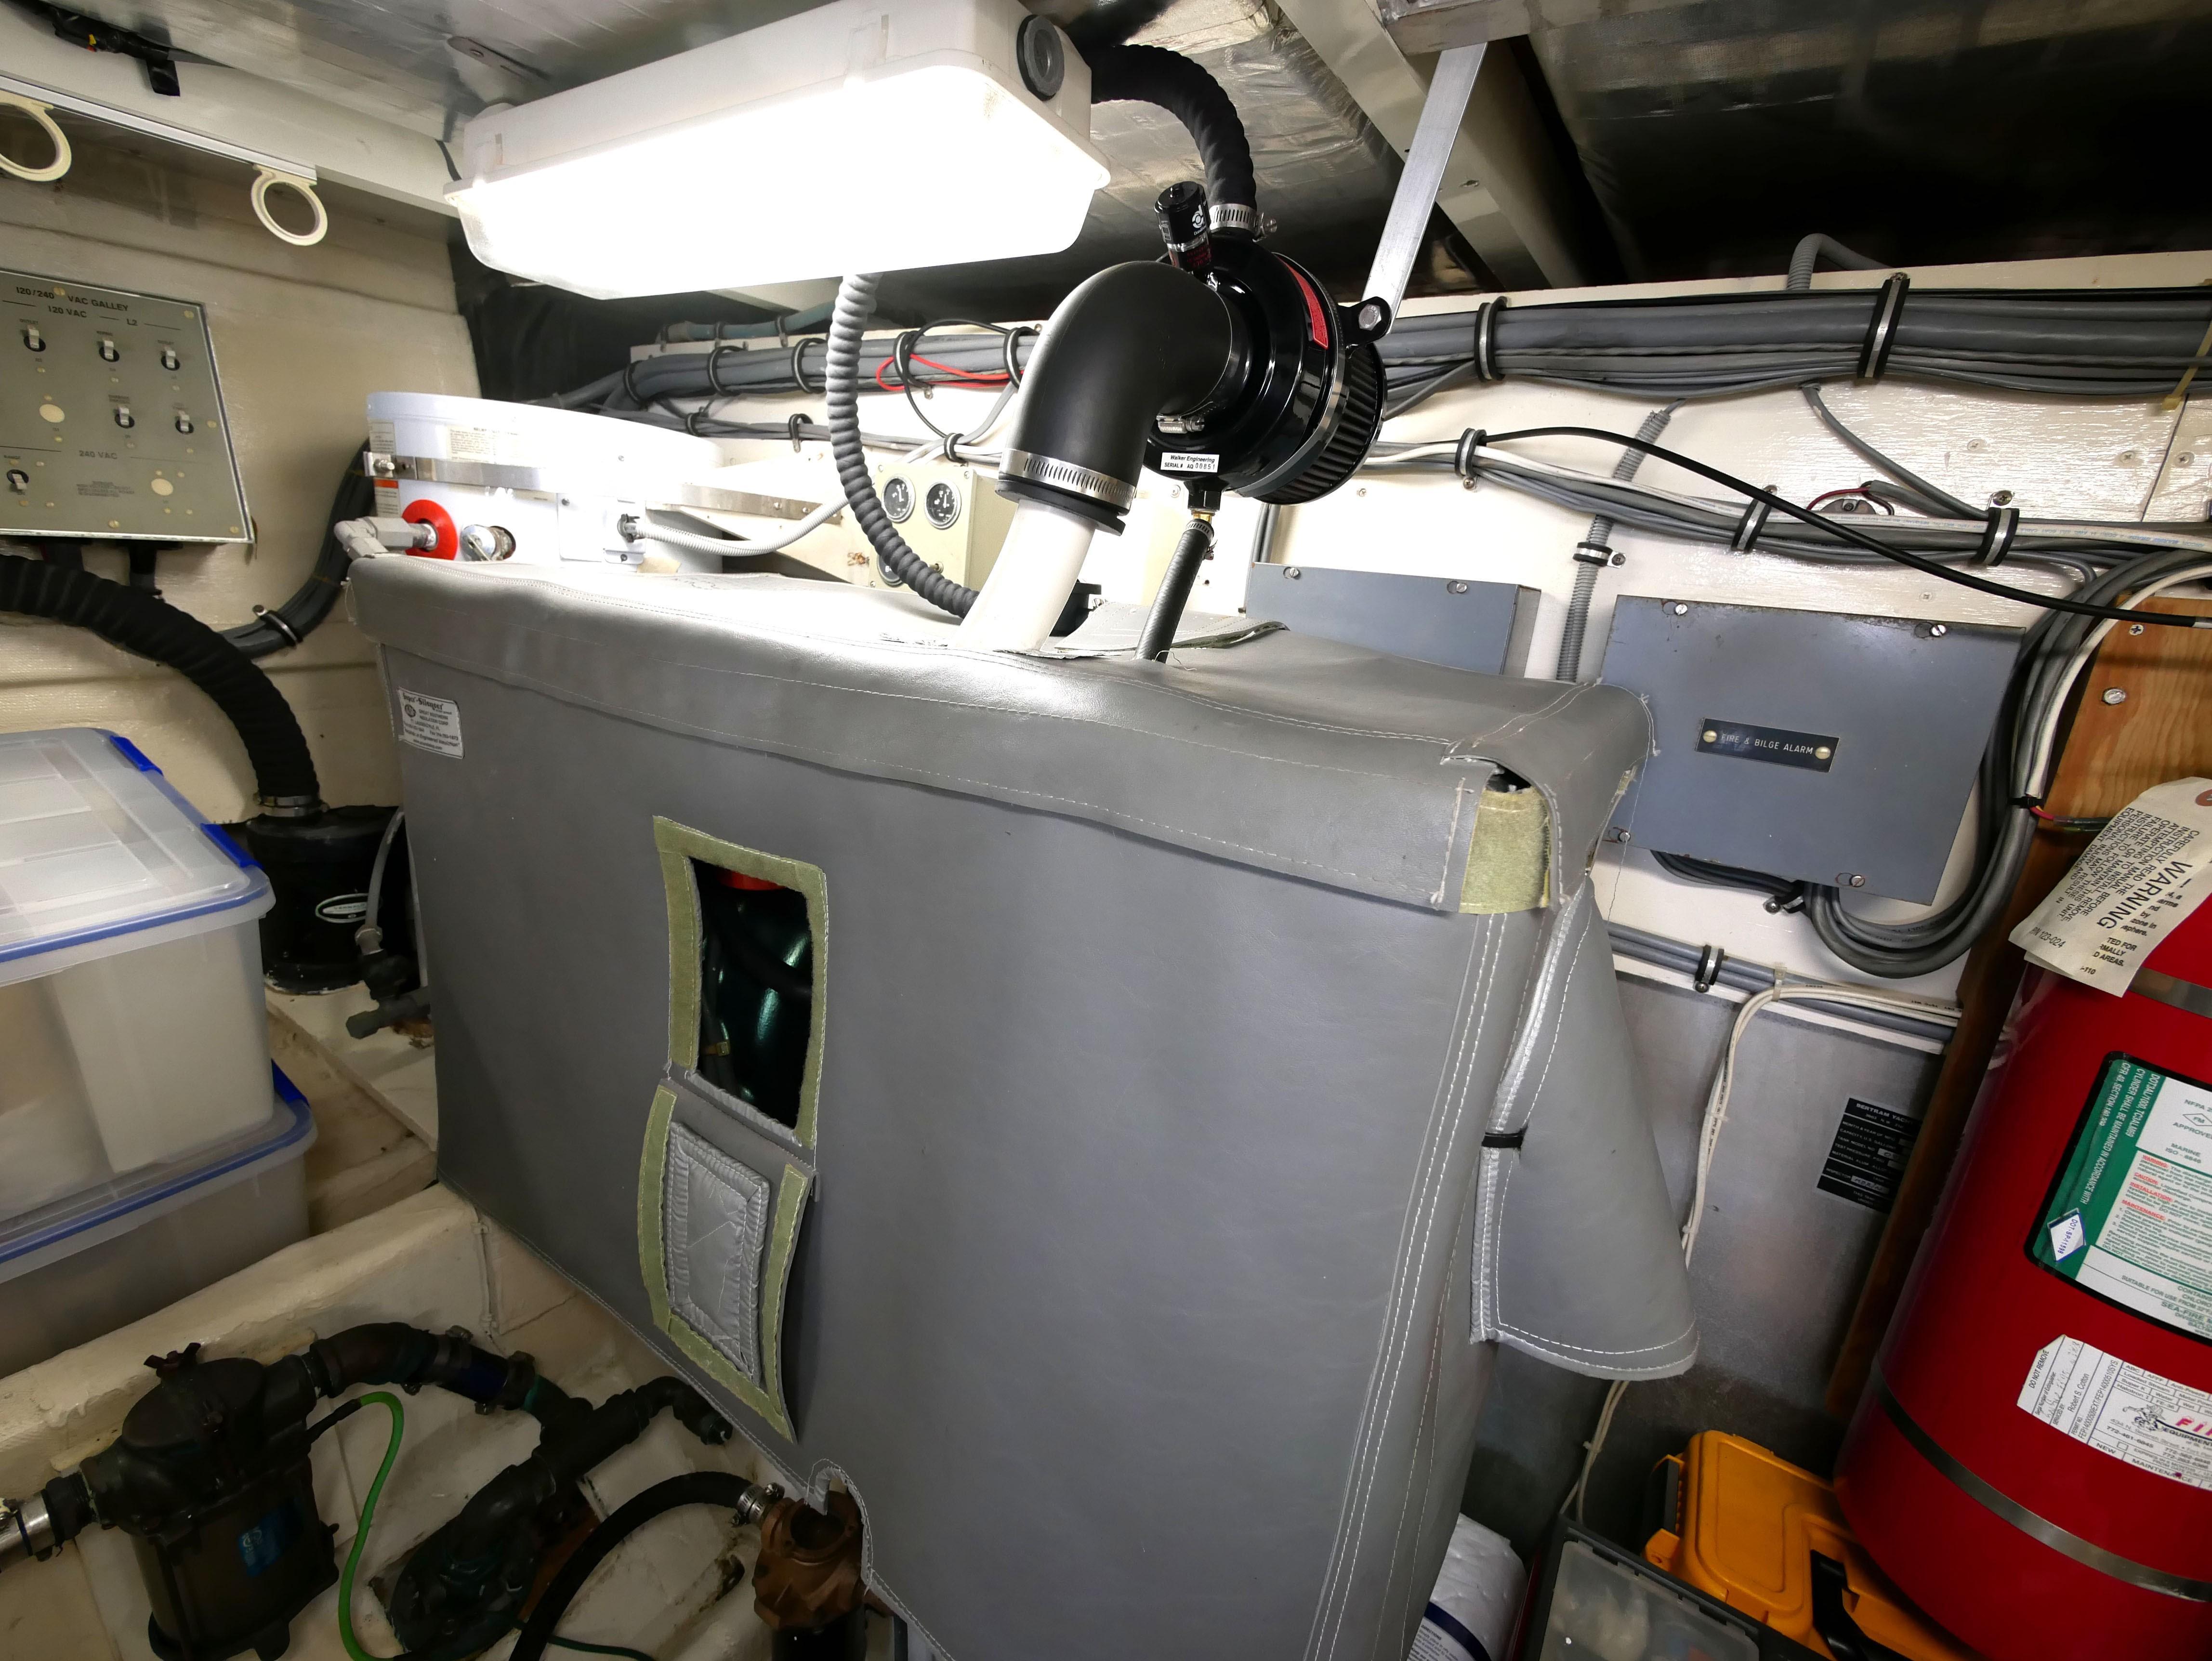 Generator in Engine Room